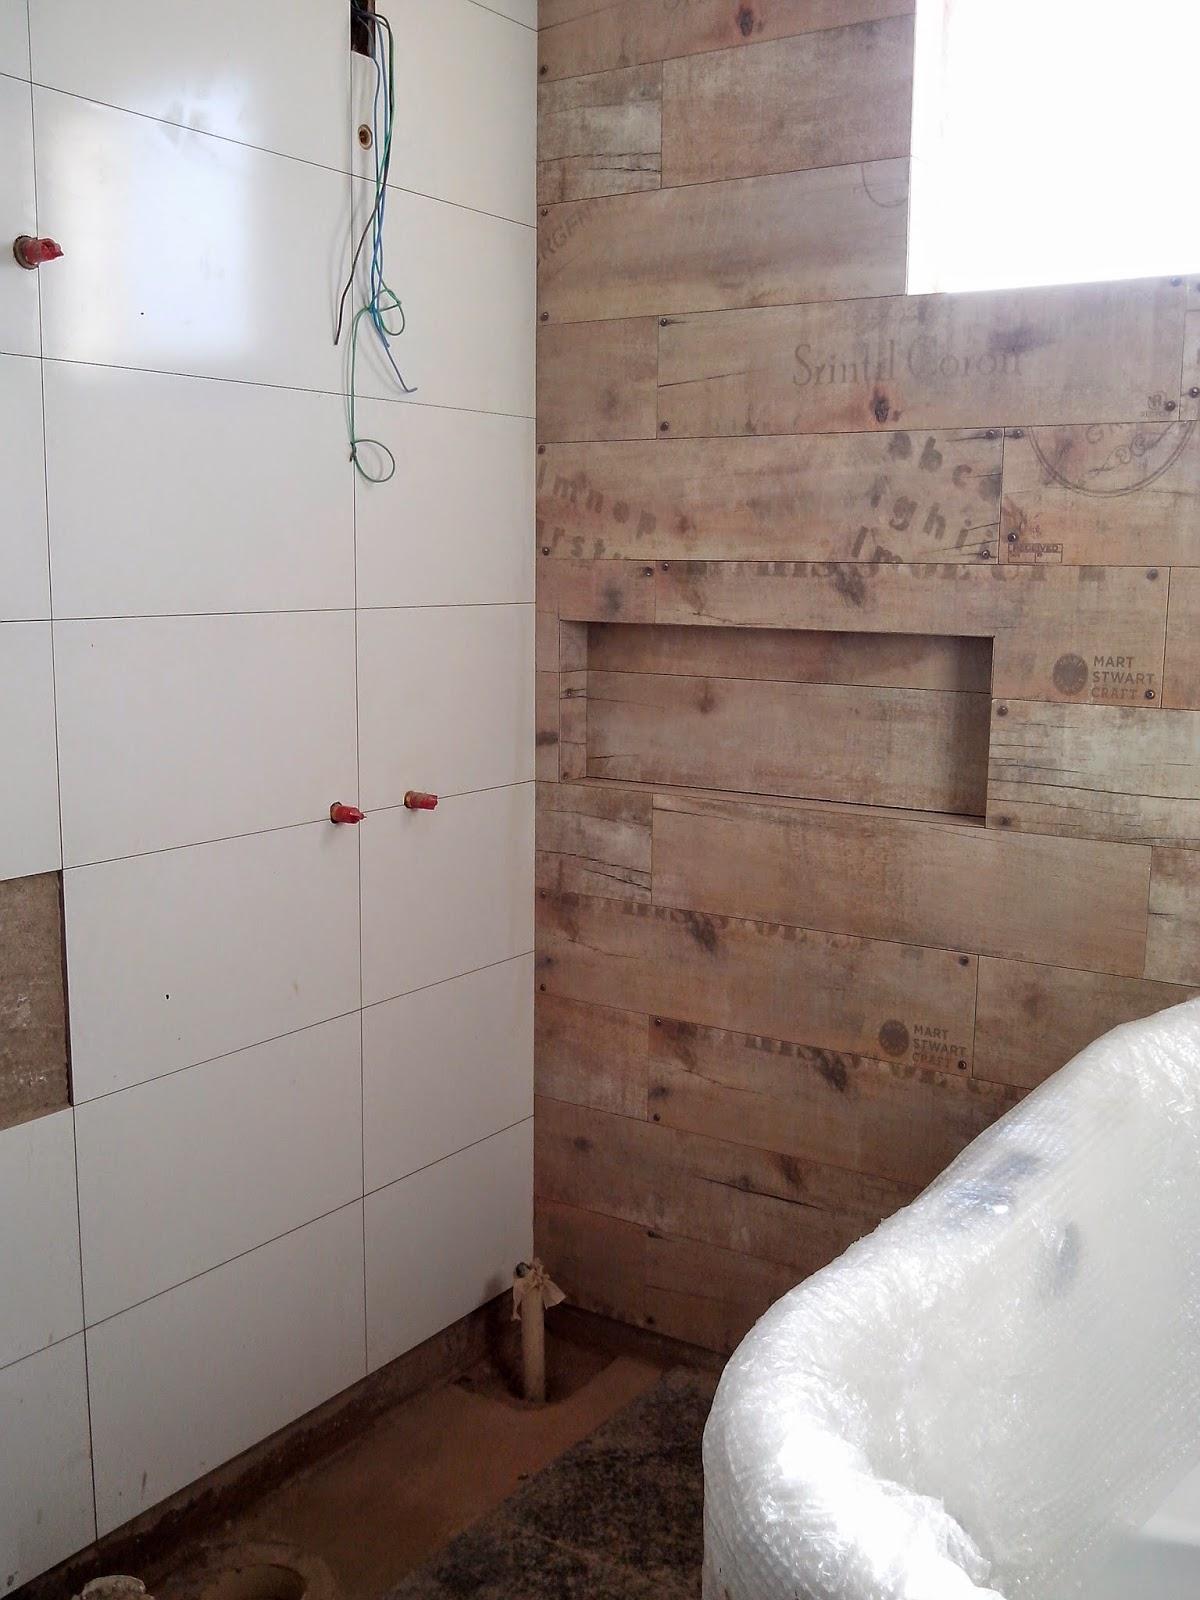 canto de Felipe e Nubia: Banheiros Acabamento Parte II #38221A 1200x1600 Acabamento Granito Banheiro